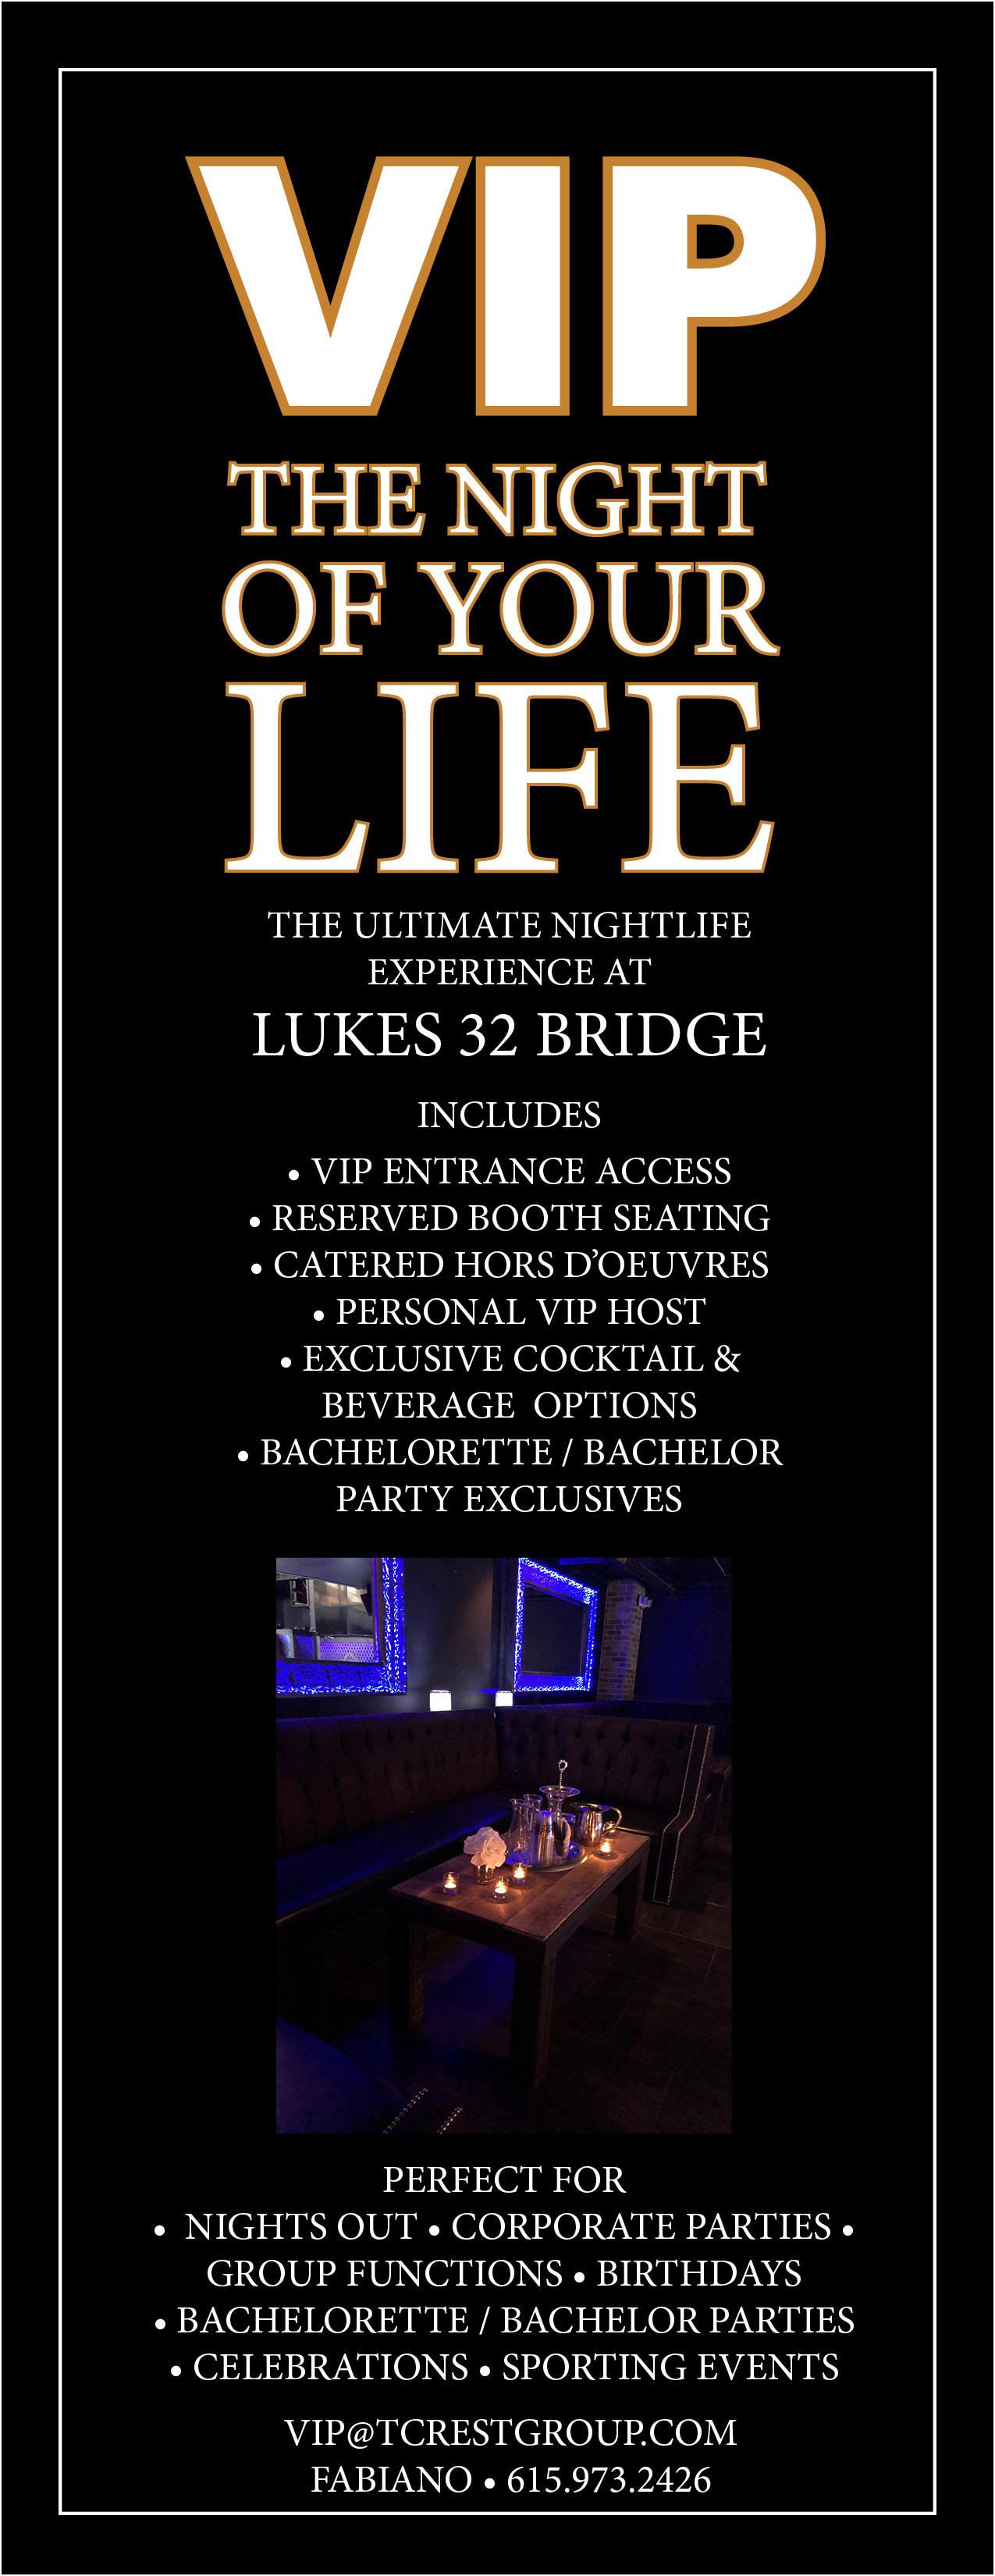 VIP & Lukes